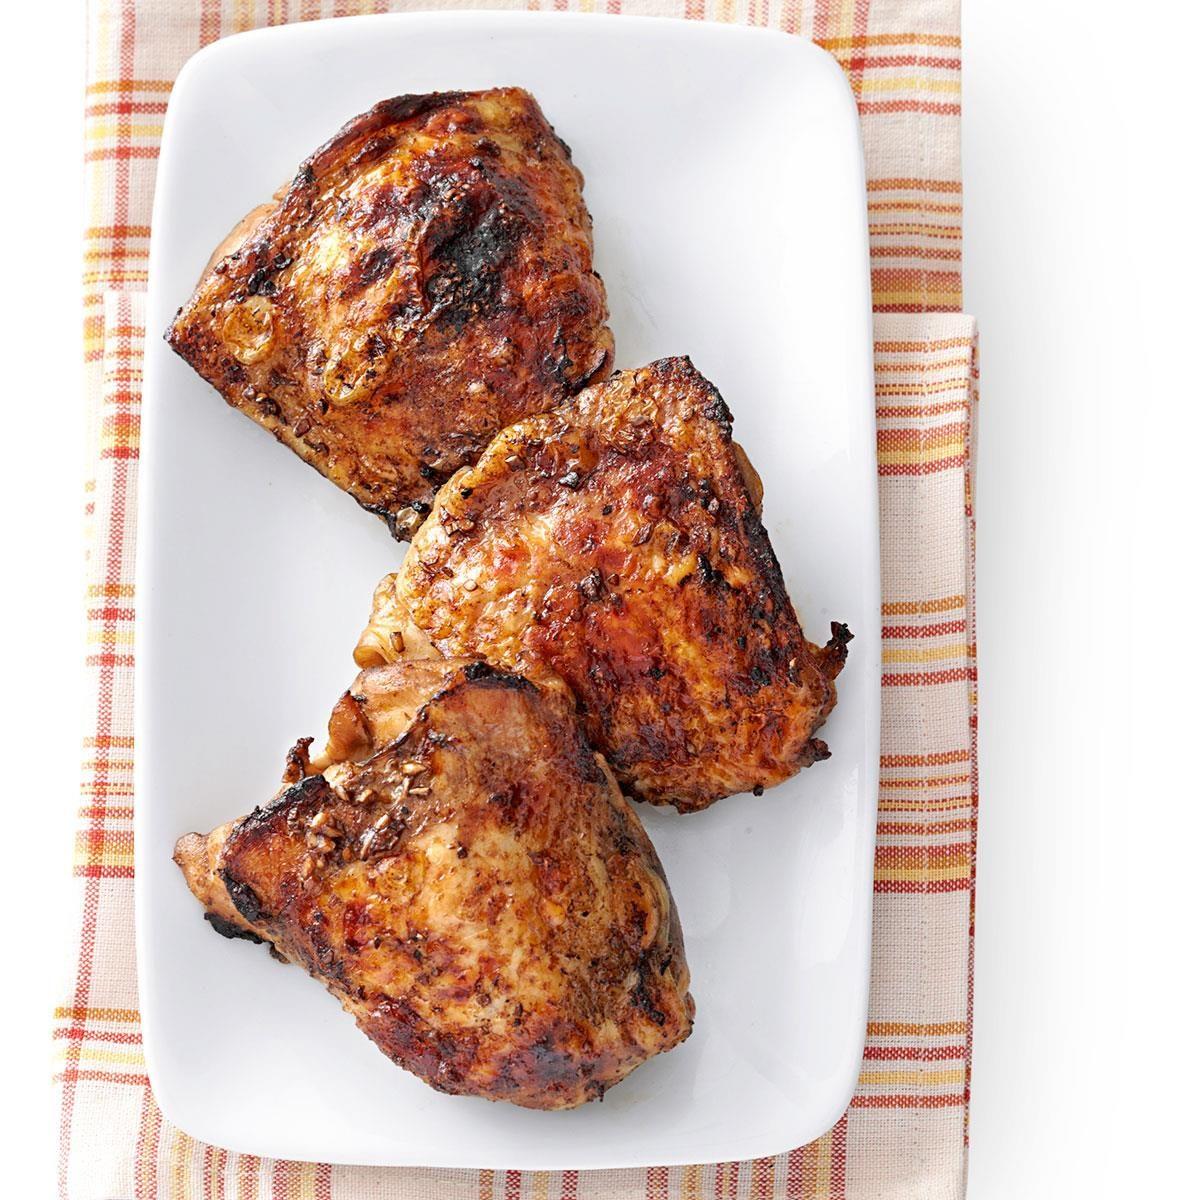 Crispy Garlic-Broiled Chicken Thighs